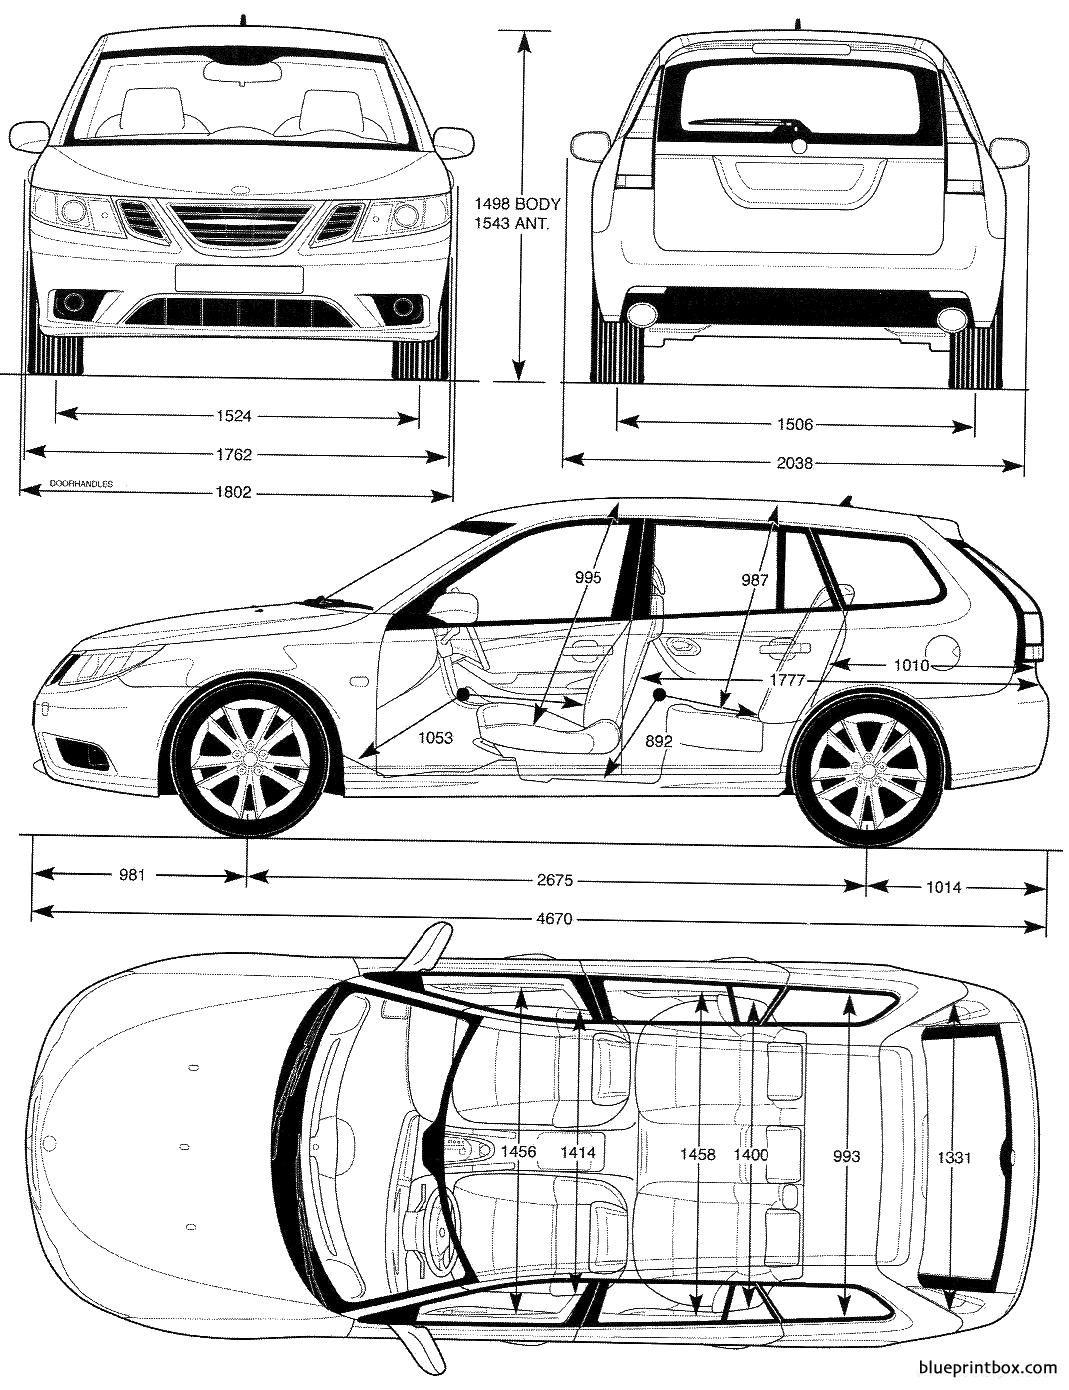 Saab 9 3 3 2008 - Blueprintbox Com